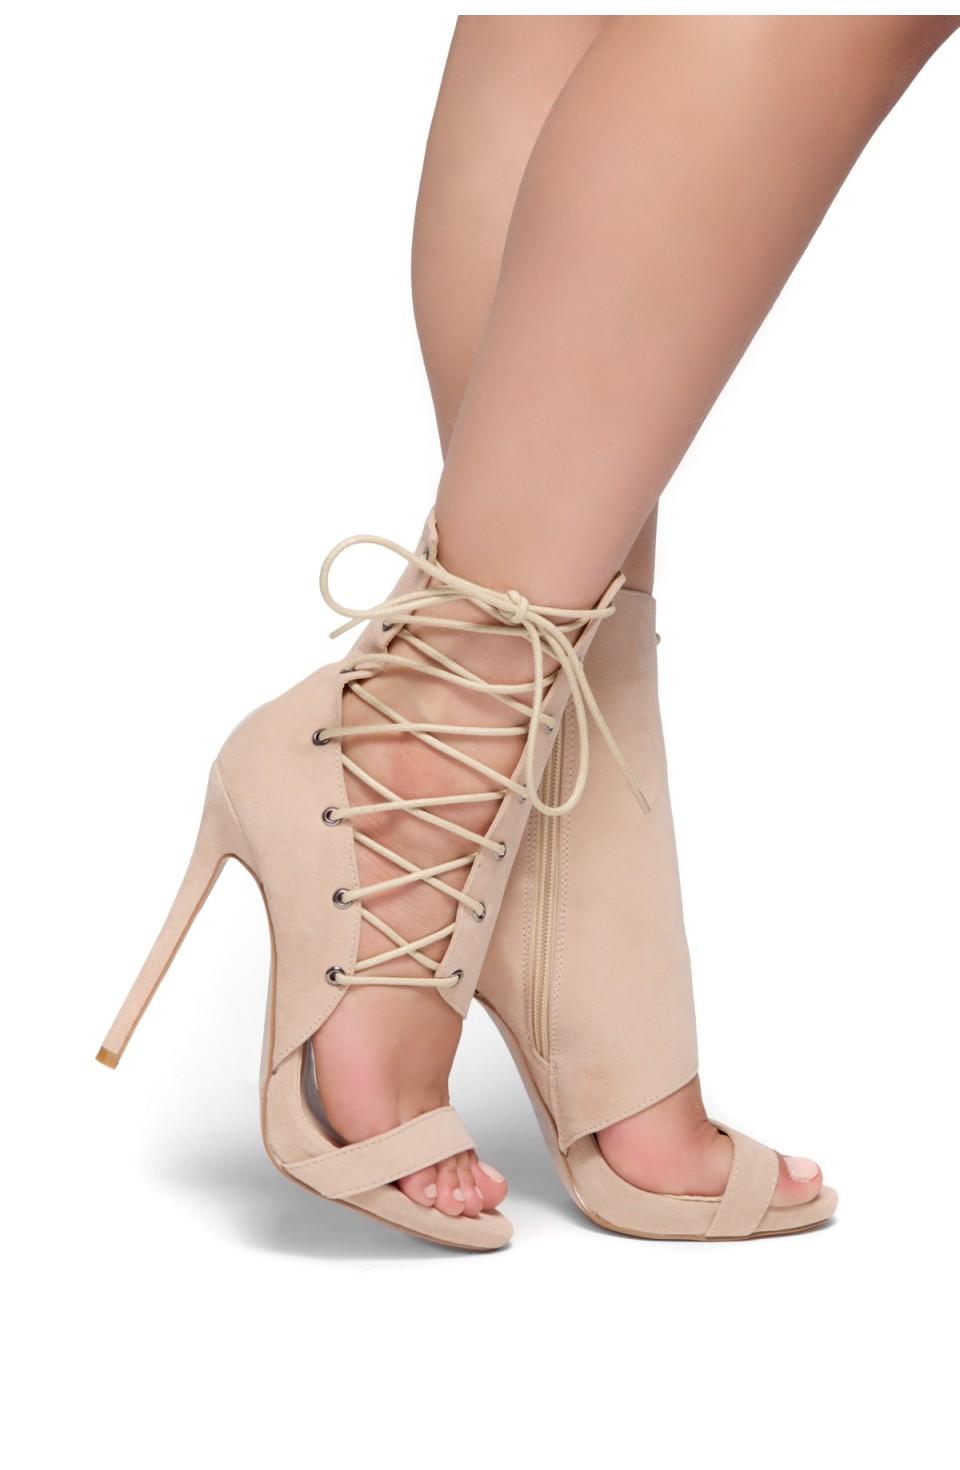 HerStyle Sheri Stiletto heel, side lace-up (Nude)